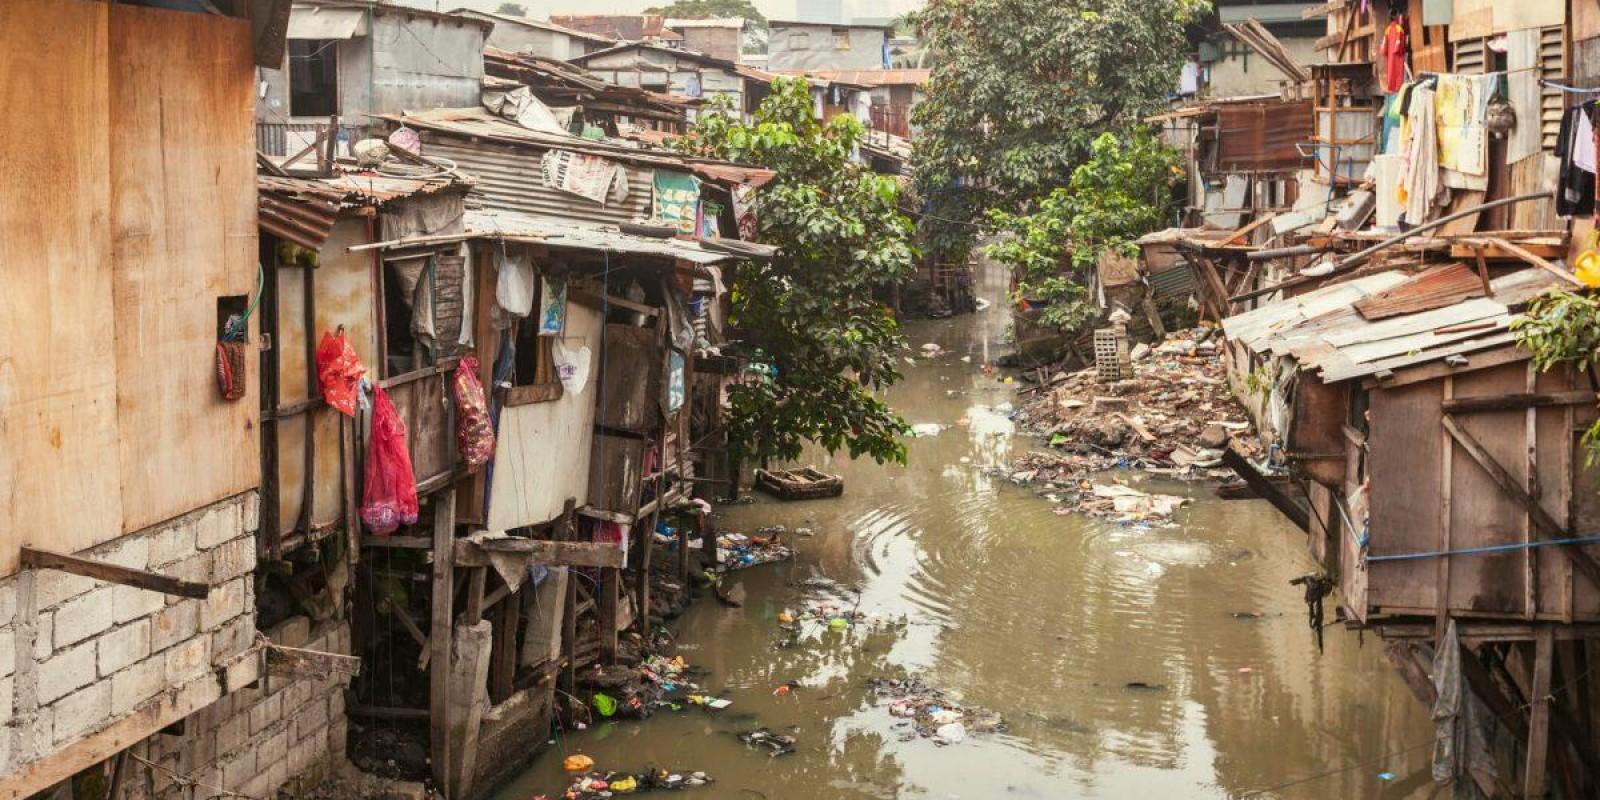 Consequências Da Falta De Saneamento Básico